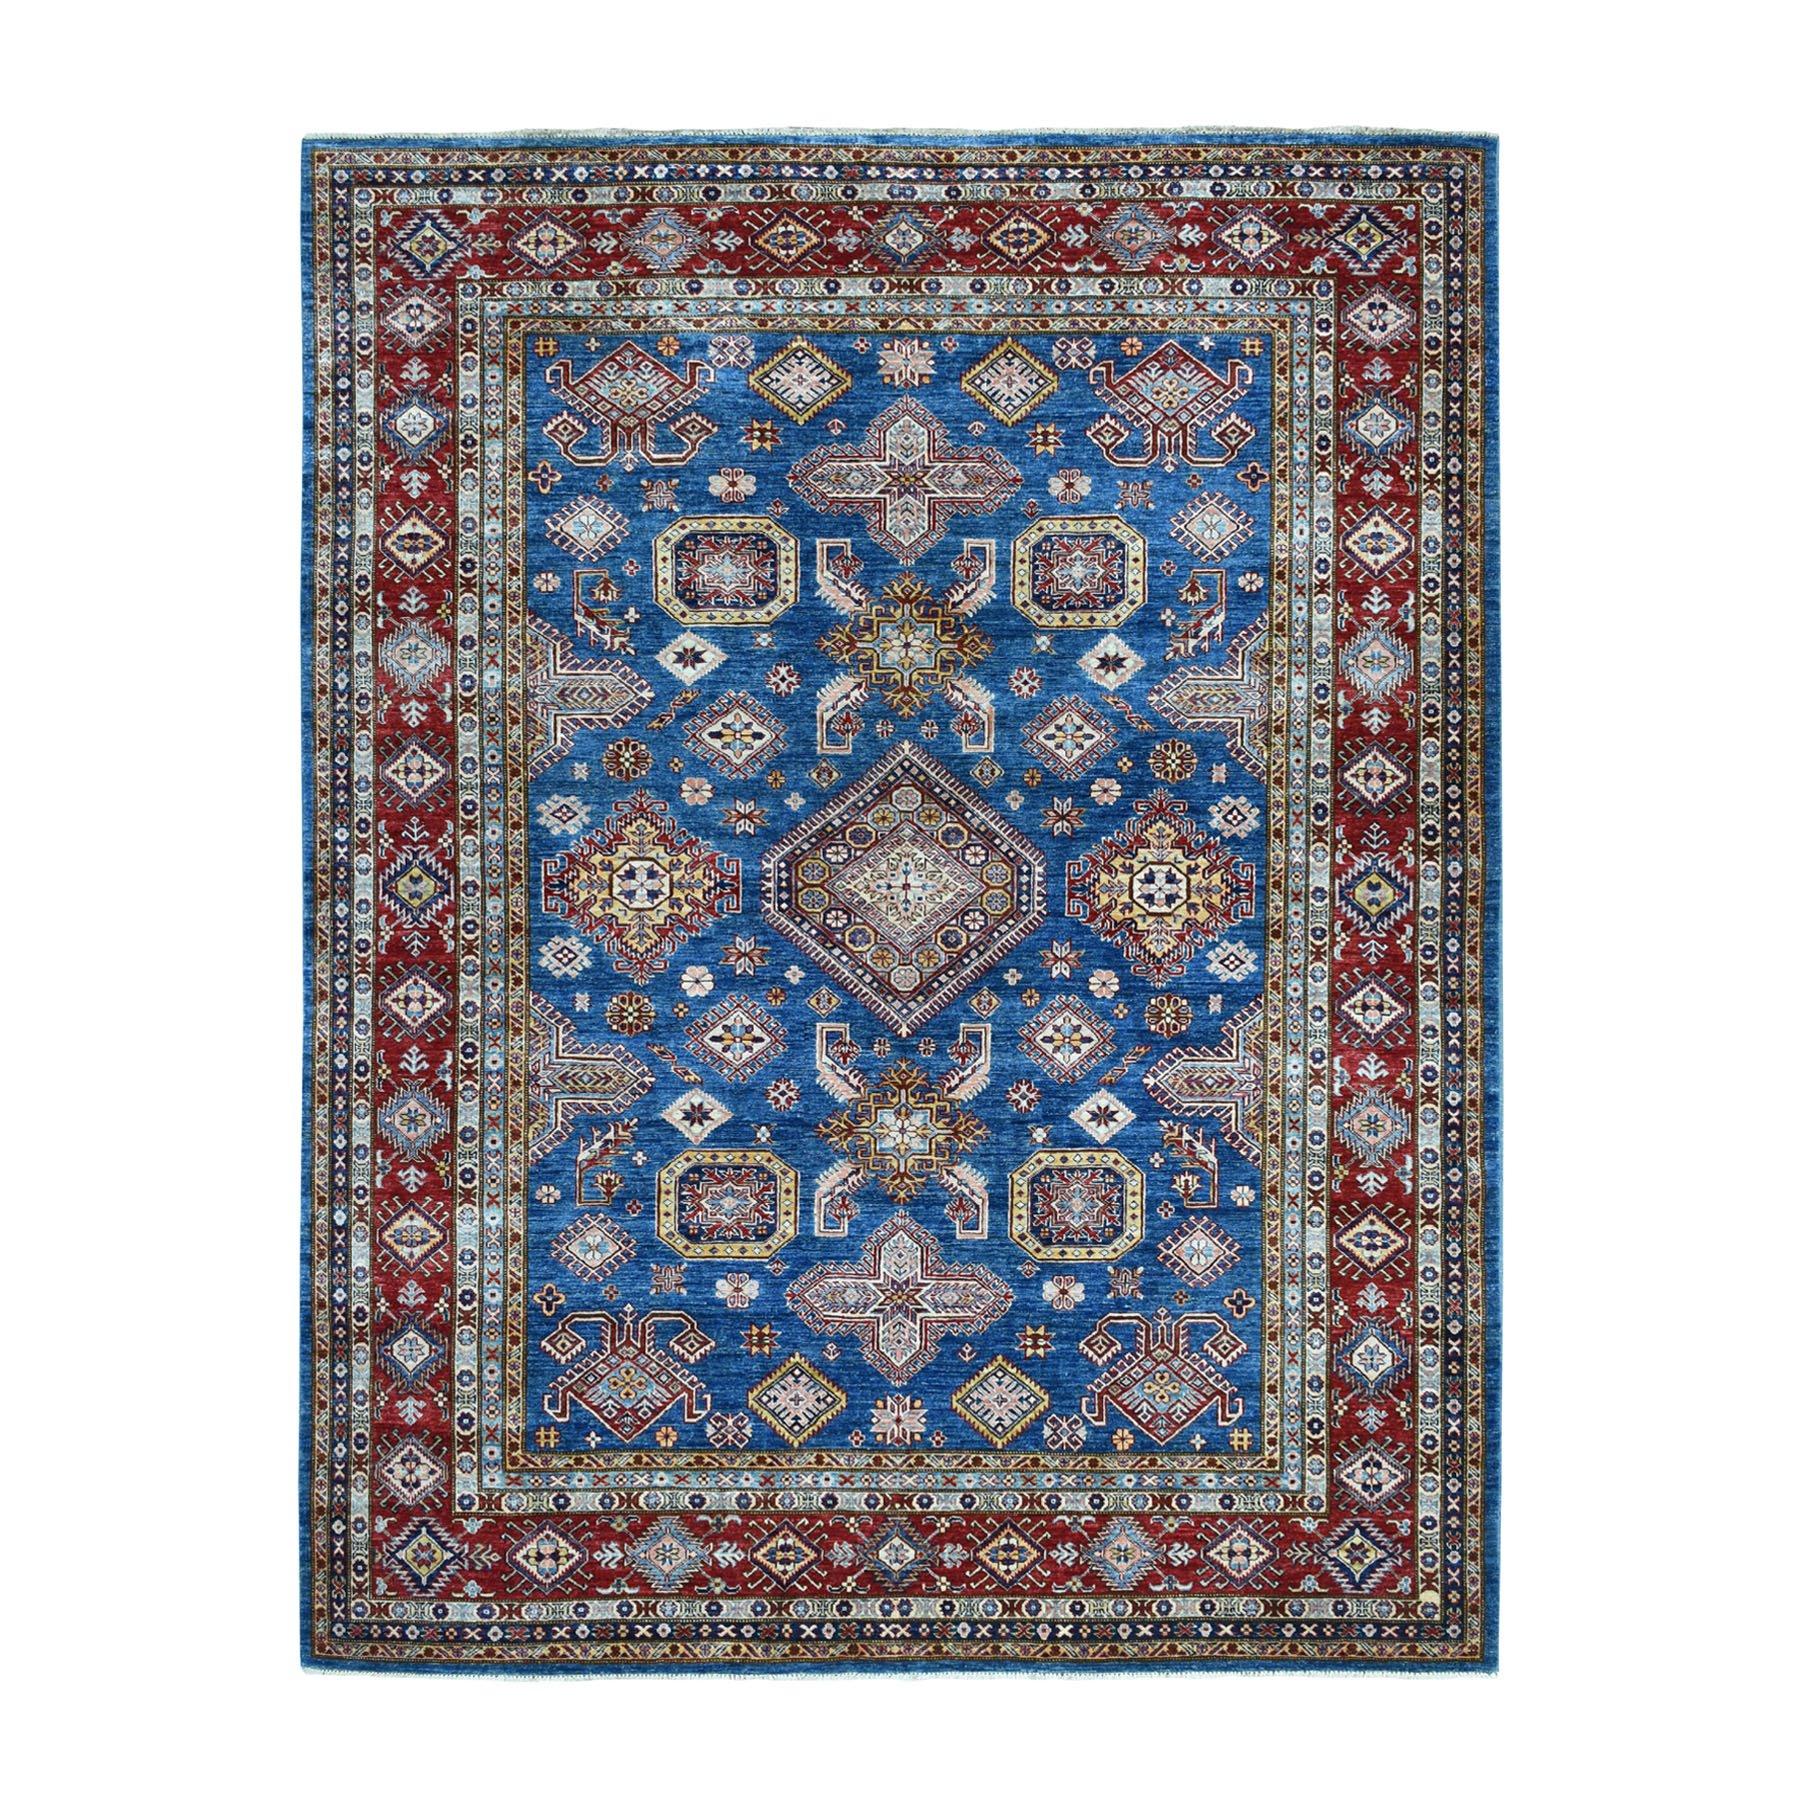 8'X10' Blue Super Kazak Geometric Design Pure Wool Hand-Knotted Oriental Rug moaeadcc